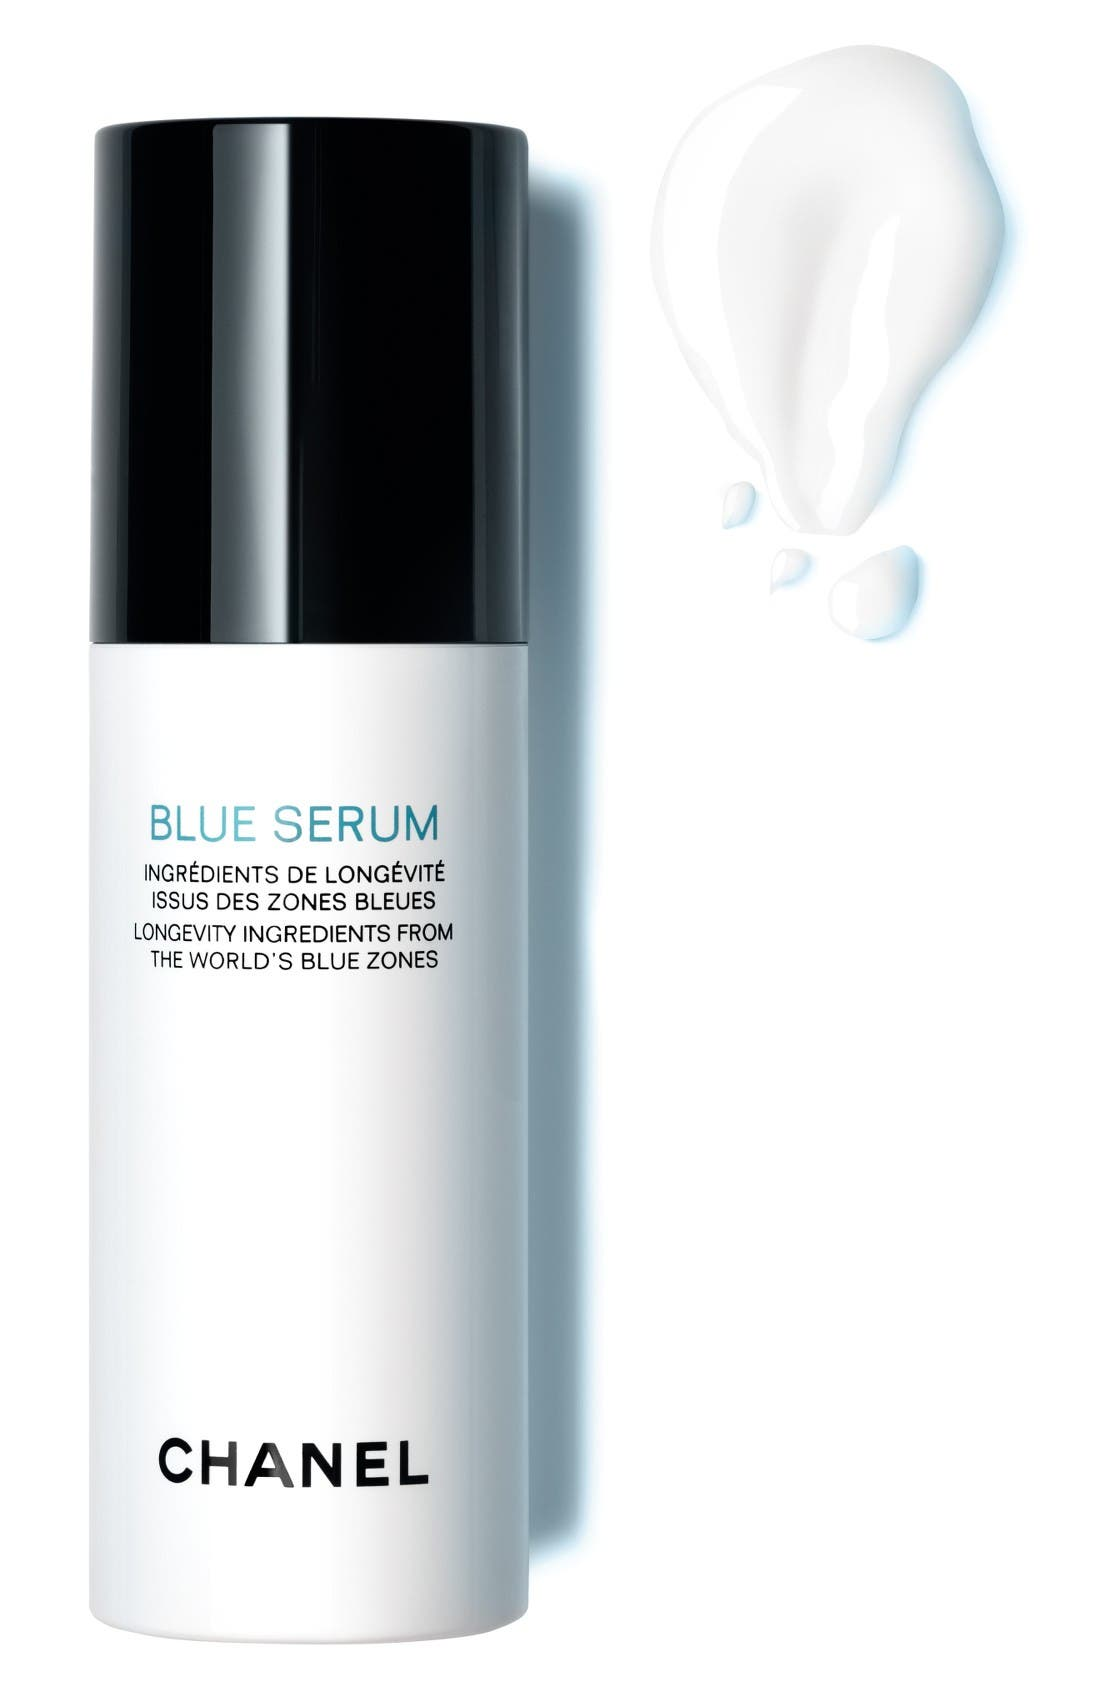 Alternate Image 2  - CHANEL BLUE SERUM  Longevity Ingredients From The World's Blue Zones